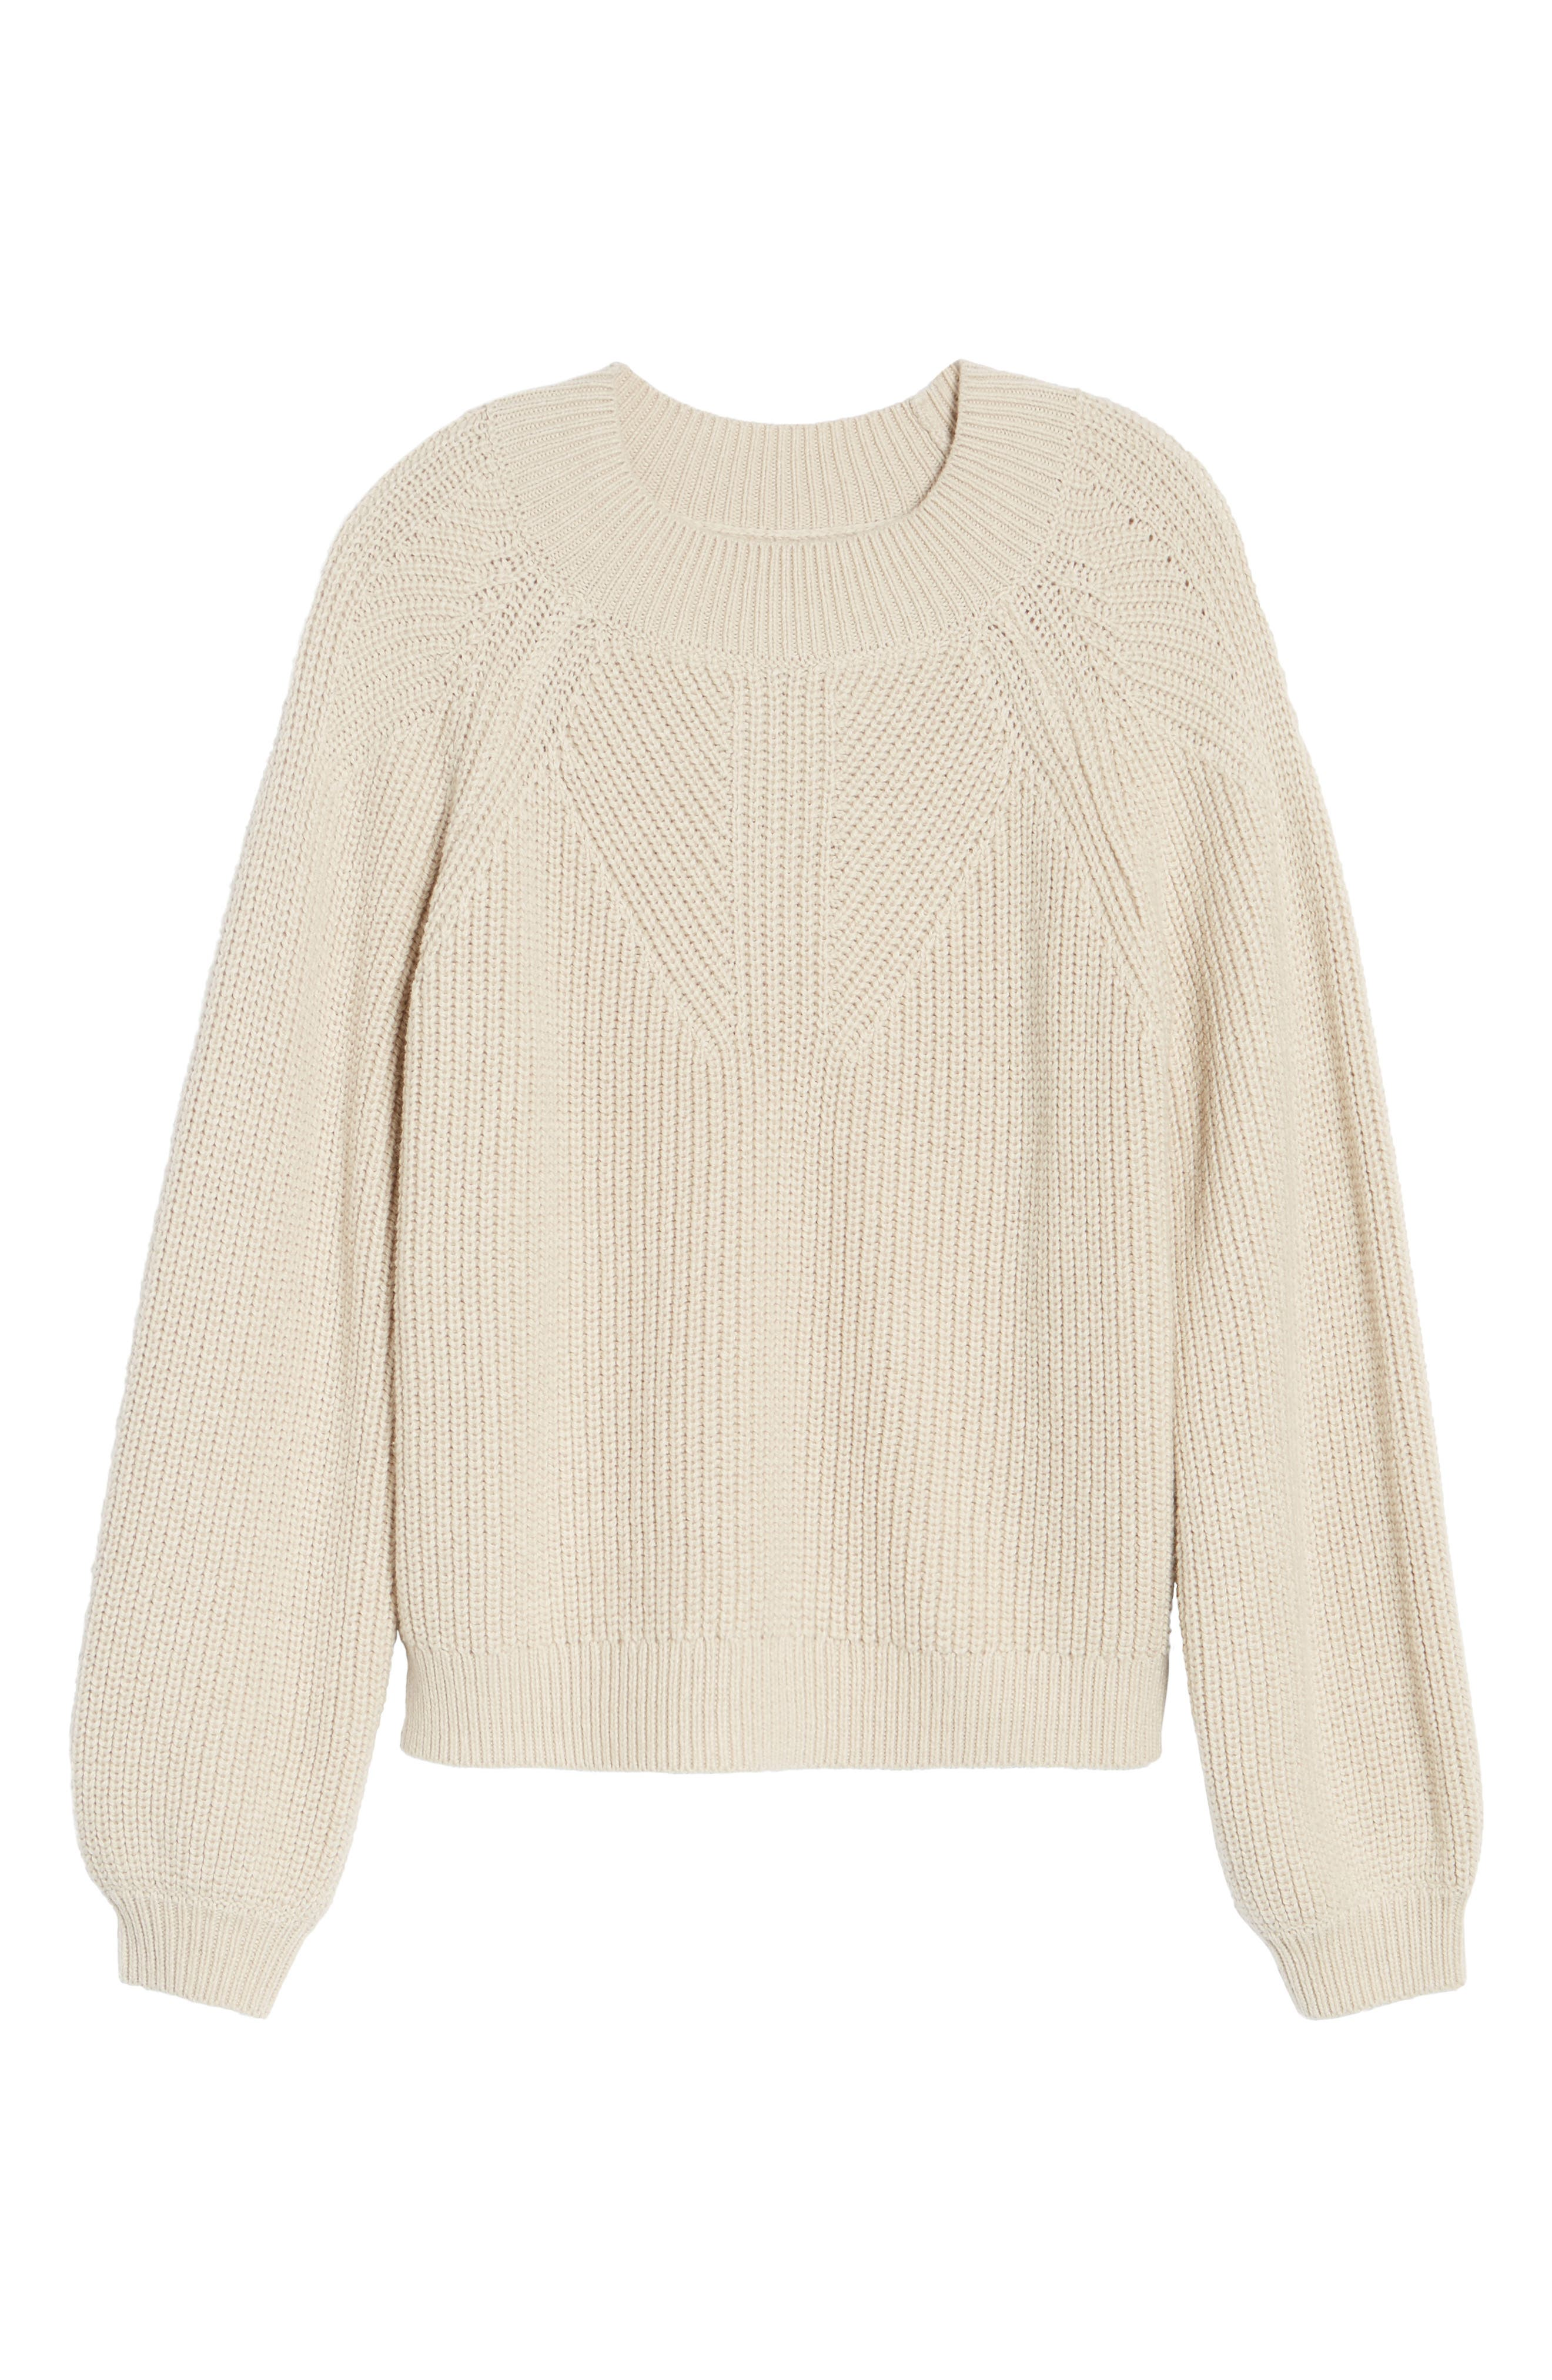 BP.,                             Shaker Stitch Sweater,                             Alternate thumbnail 6, color,                             270